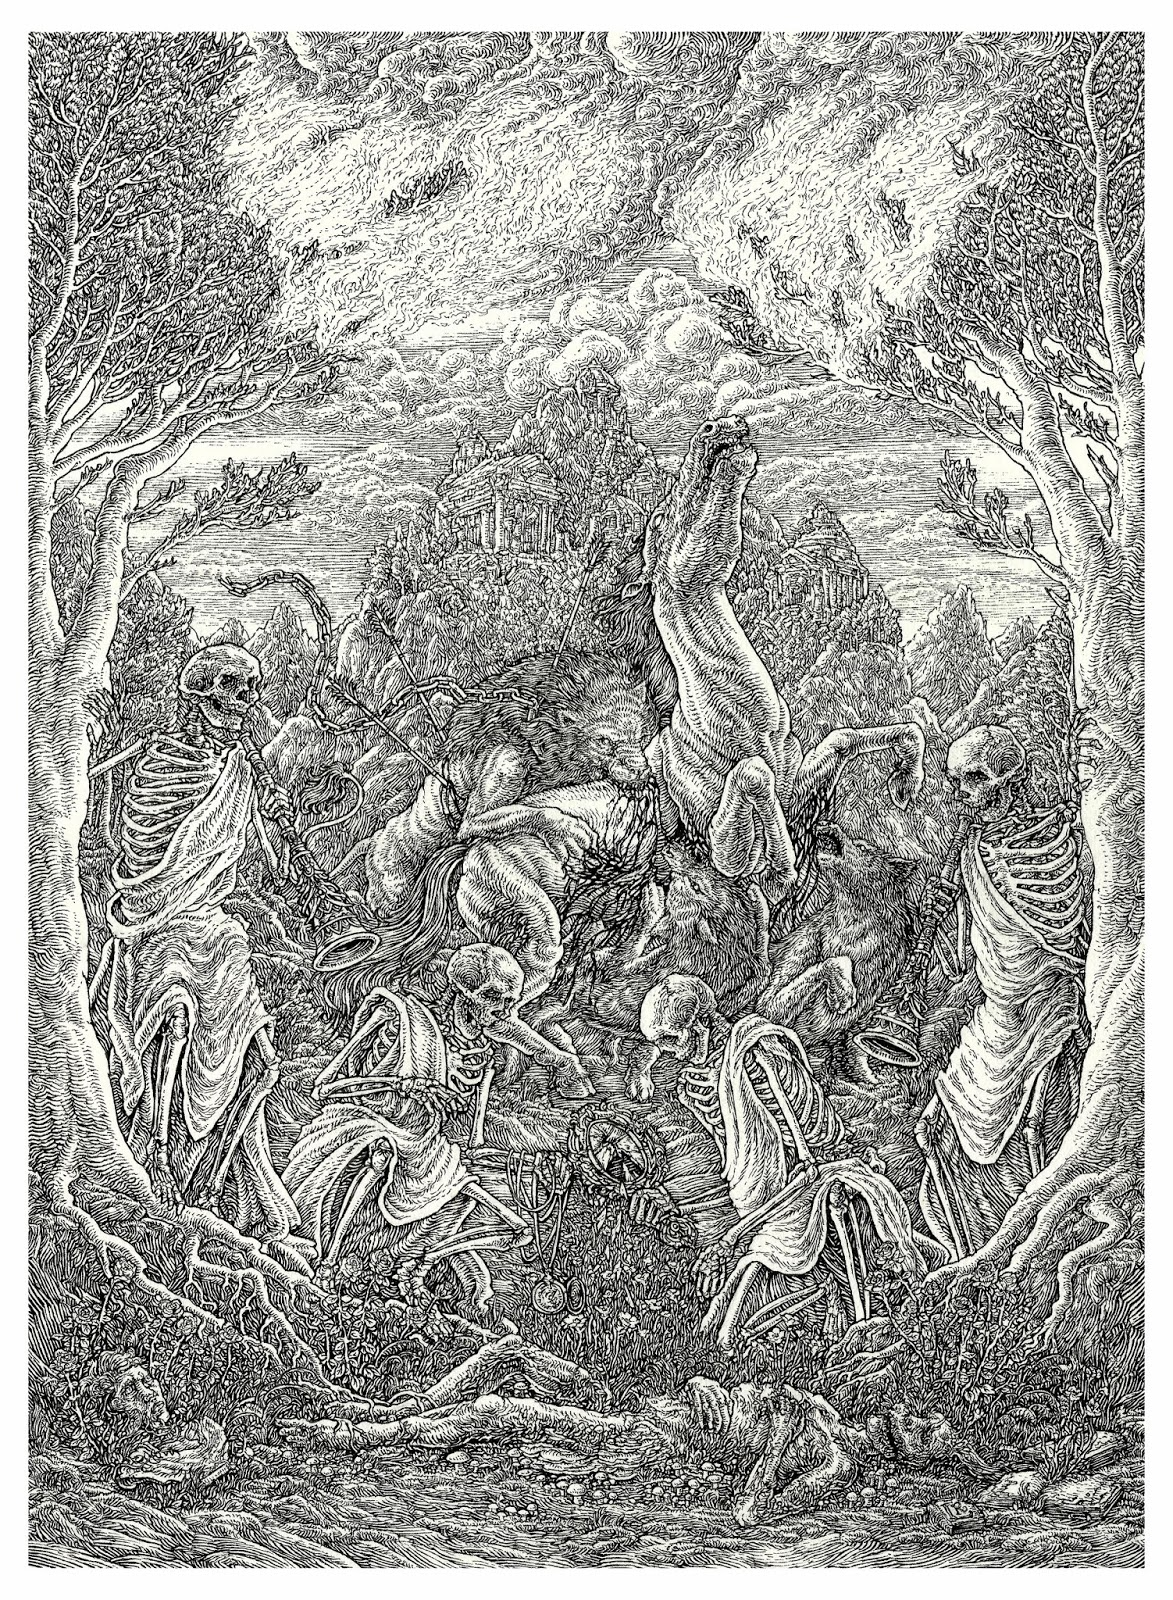 Lucas Ruggieri Illustration Danse Macabre New Piece Now